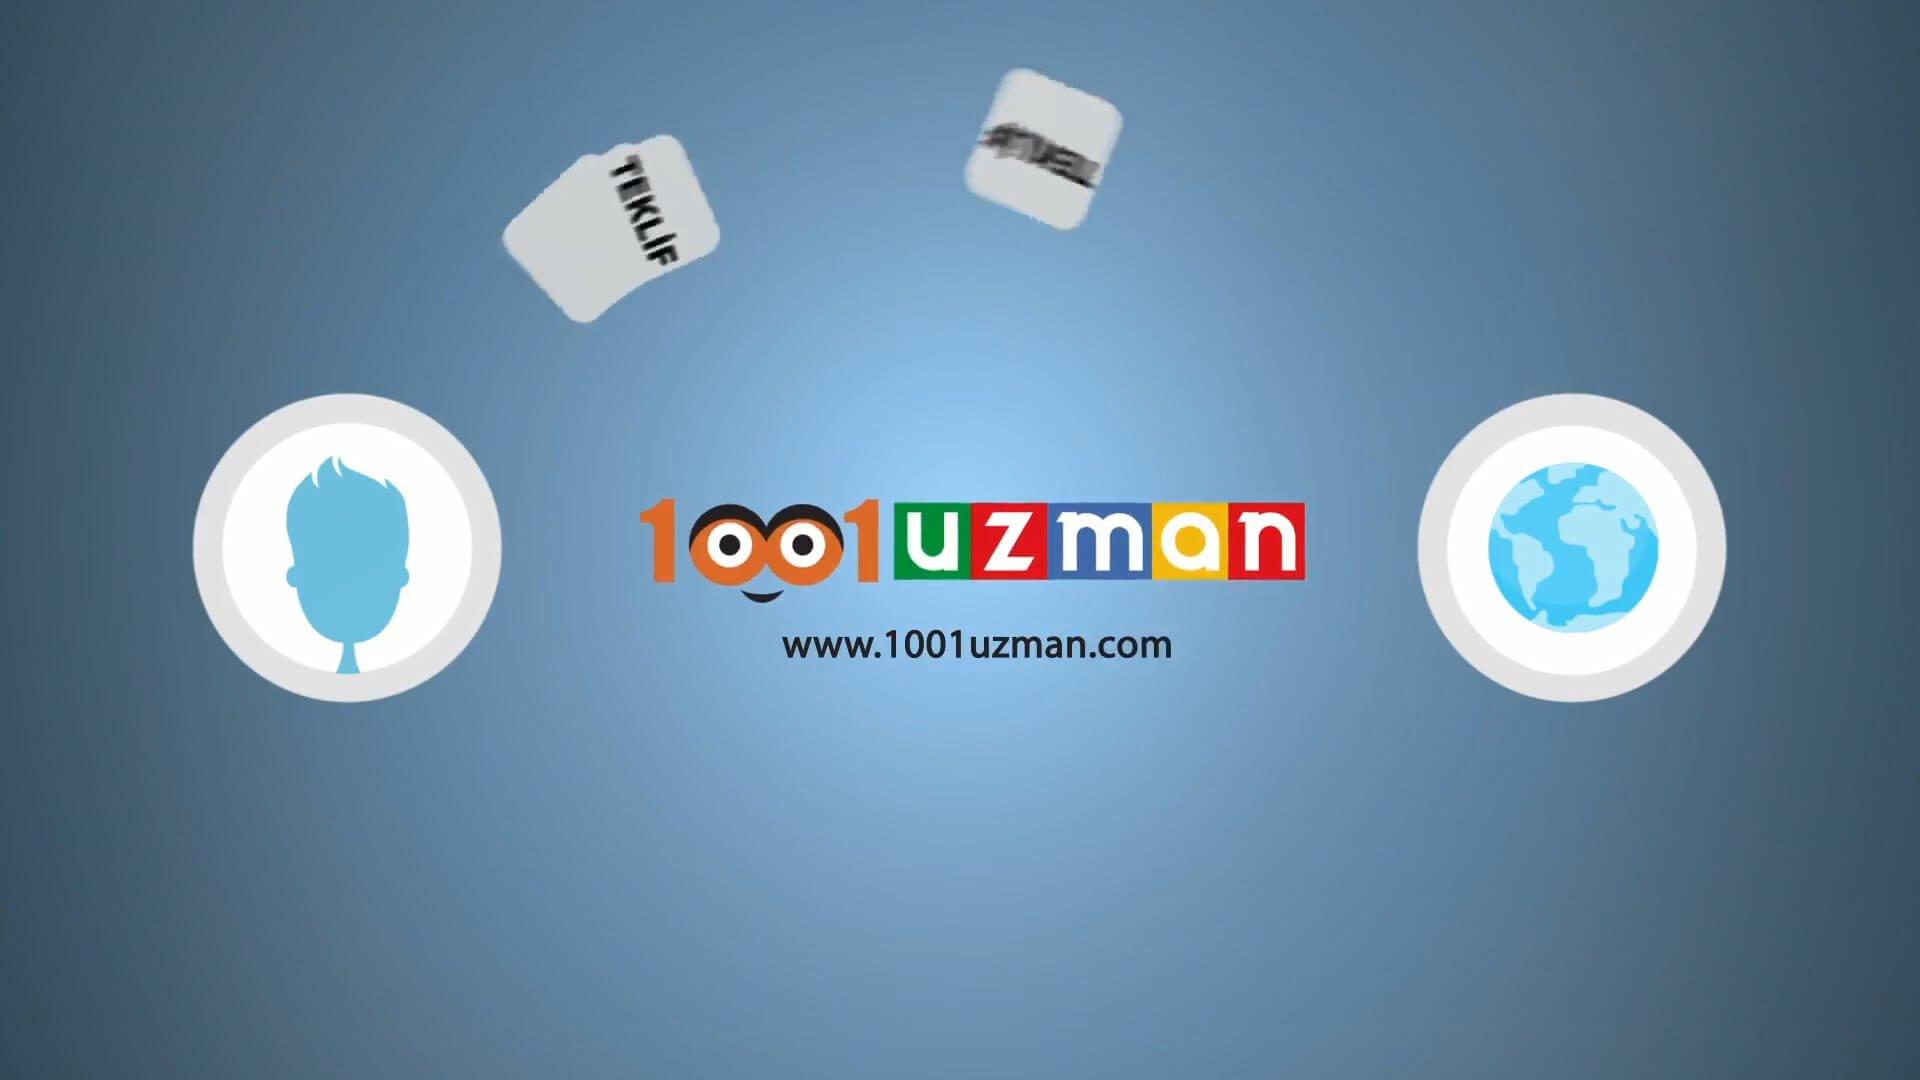 1001Uzman1 1920x1080 - 1001uzman.com Animasyon Filmi